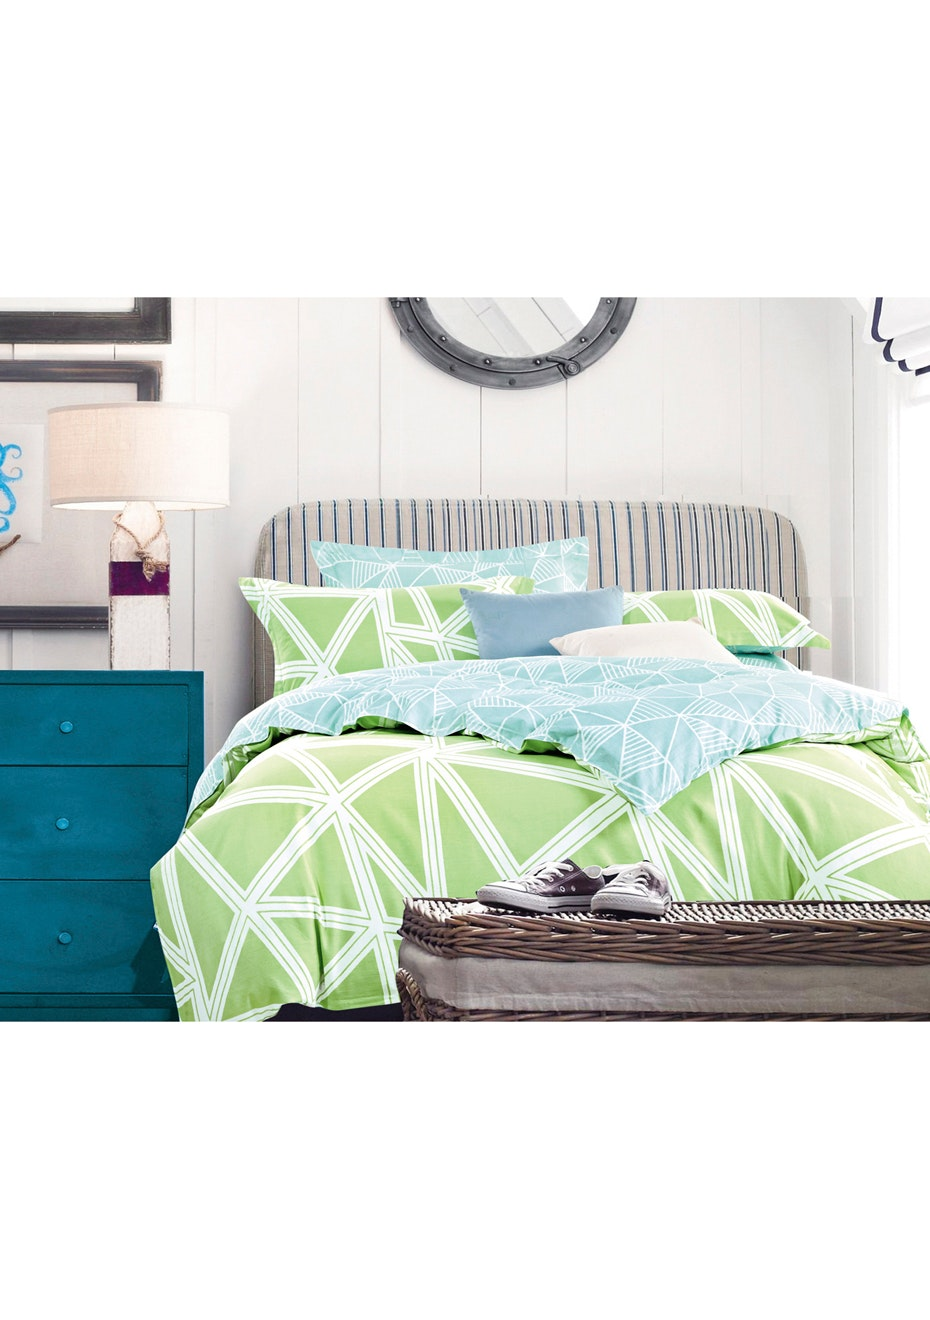 Mollymook Green Quilt Cover Set - Queen Bed - Reversible Design